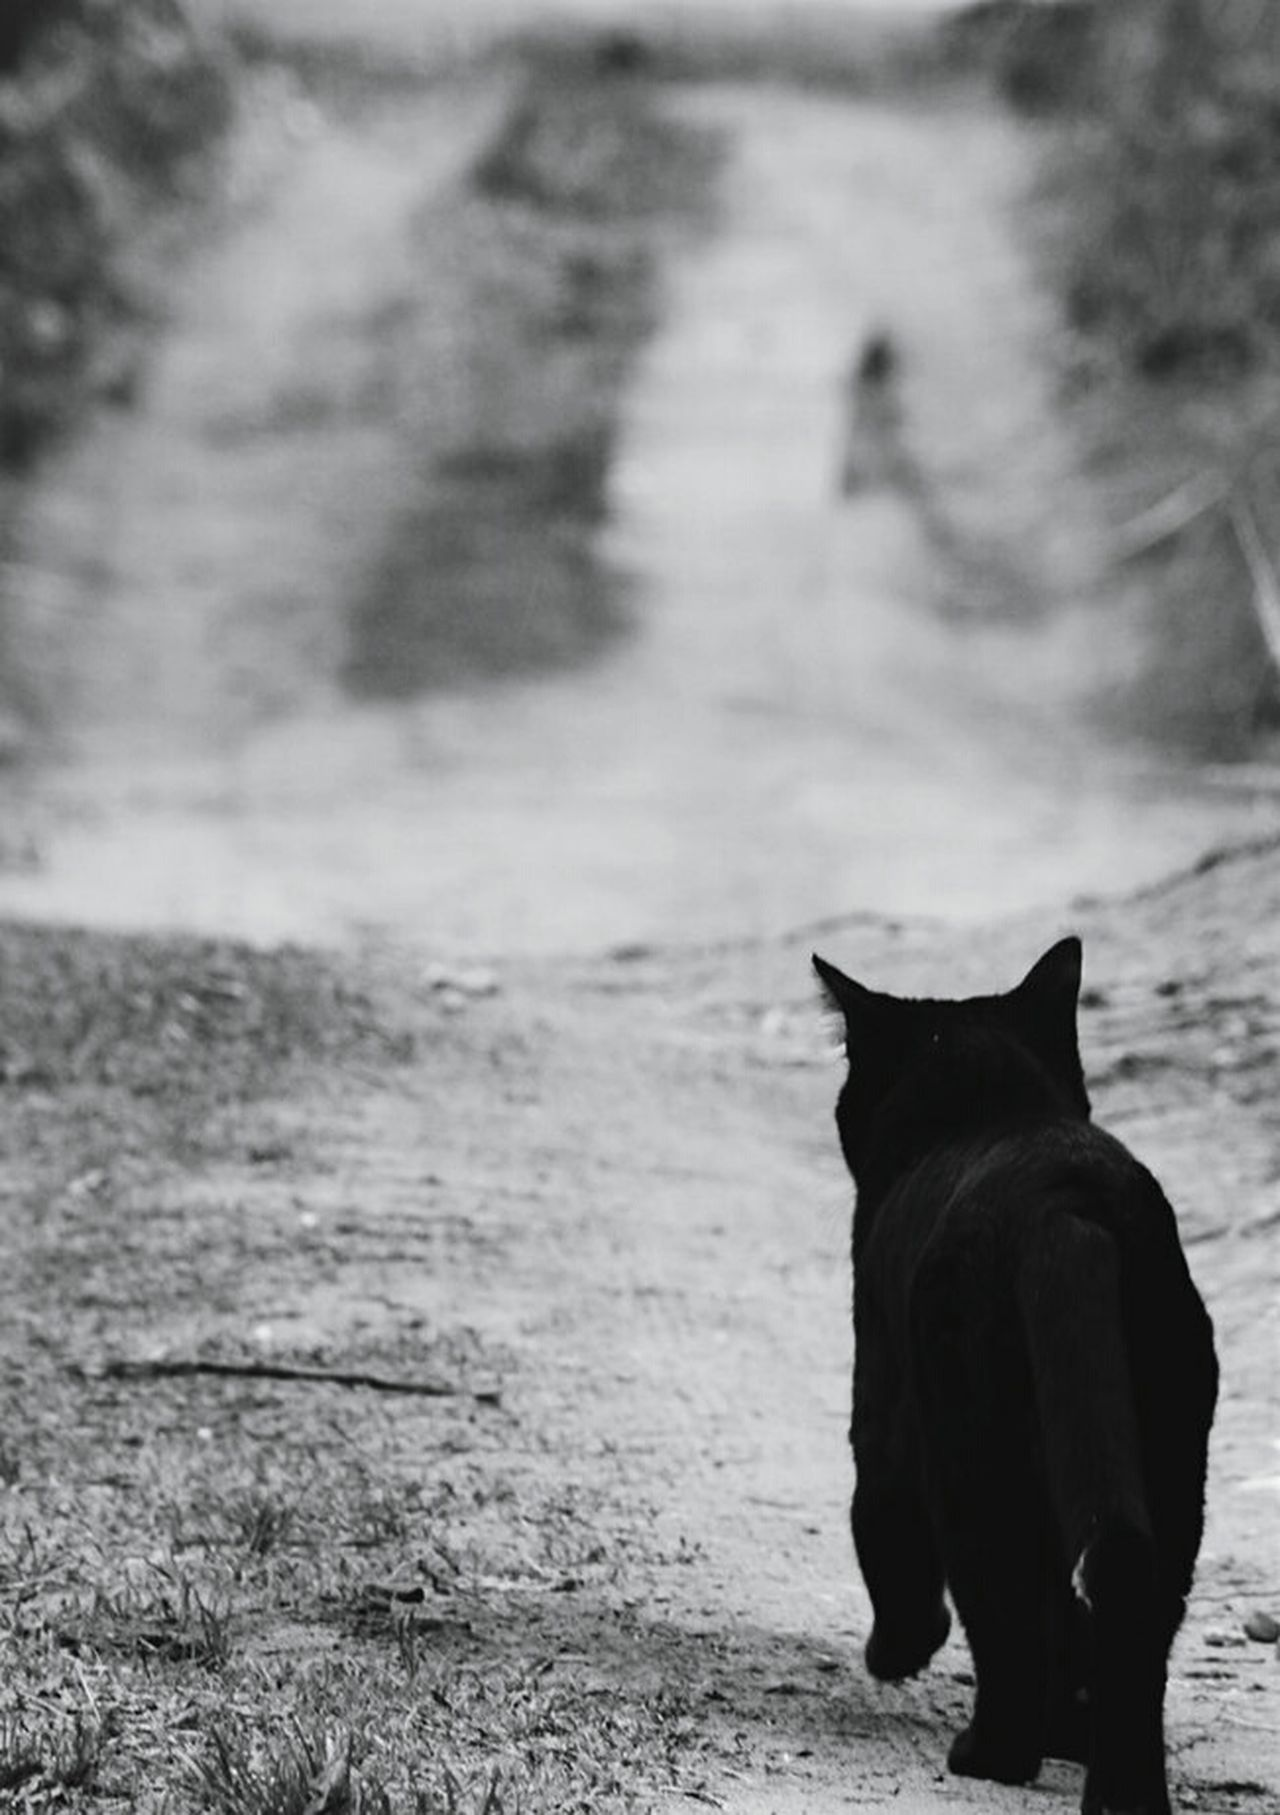 Dark Road Cat Blackandwhite Black And White Black & White Black And White Collection  Springtime Homeless Cats Homeless Sad & Lonely